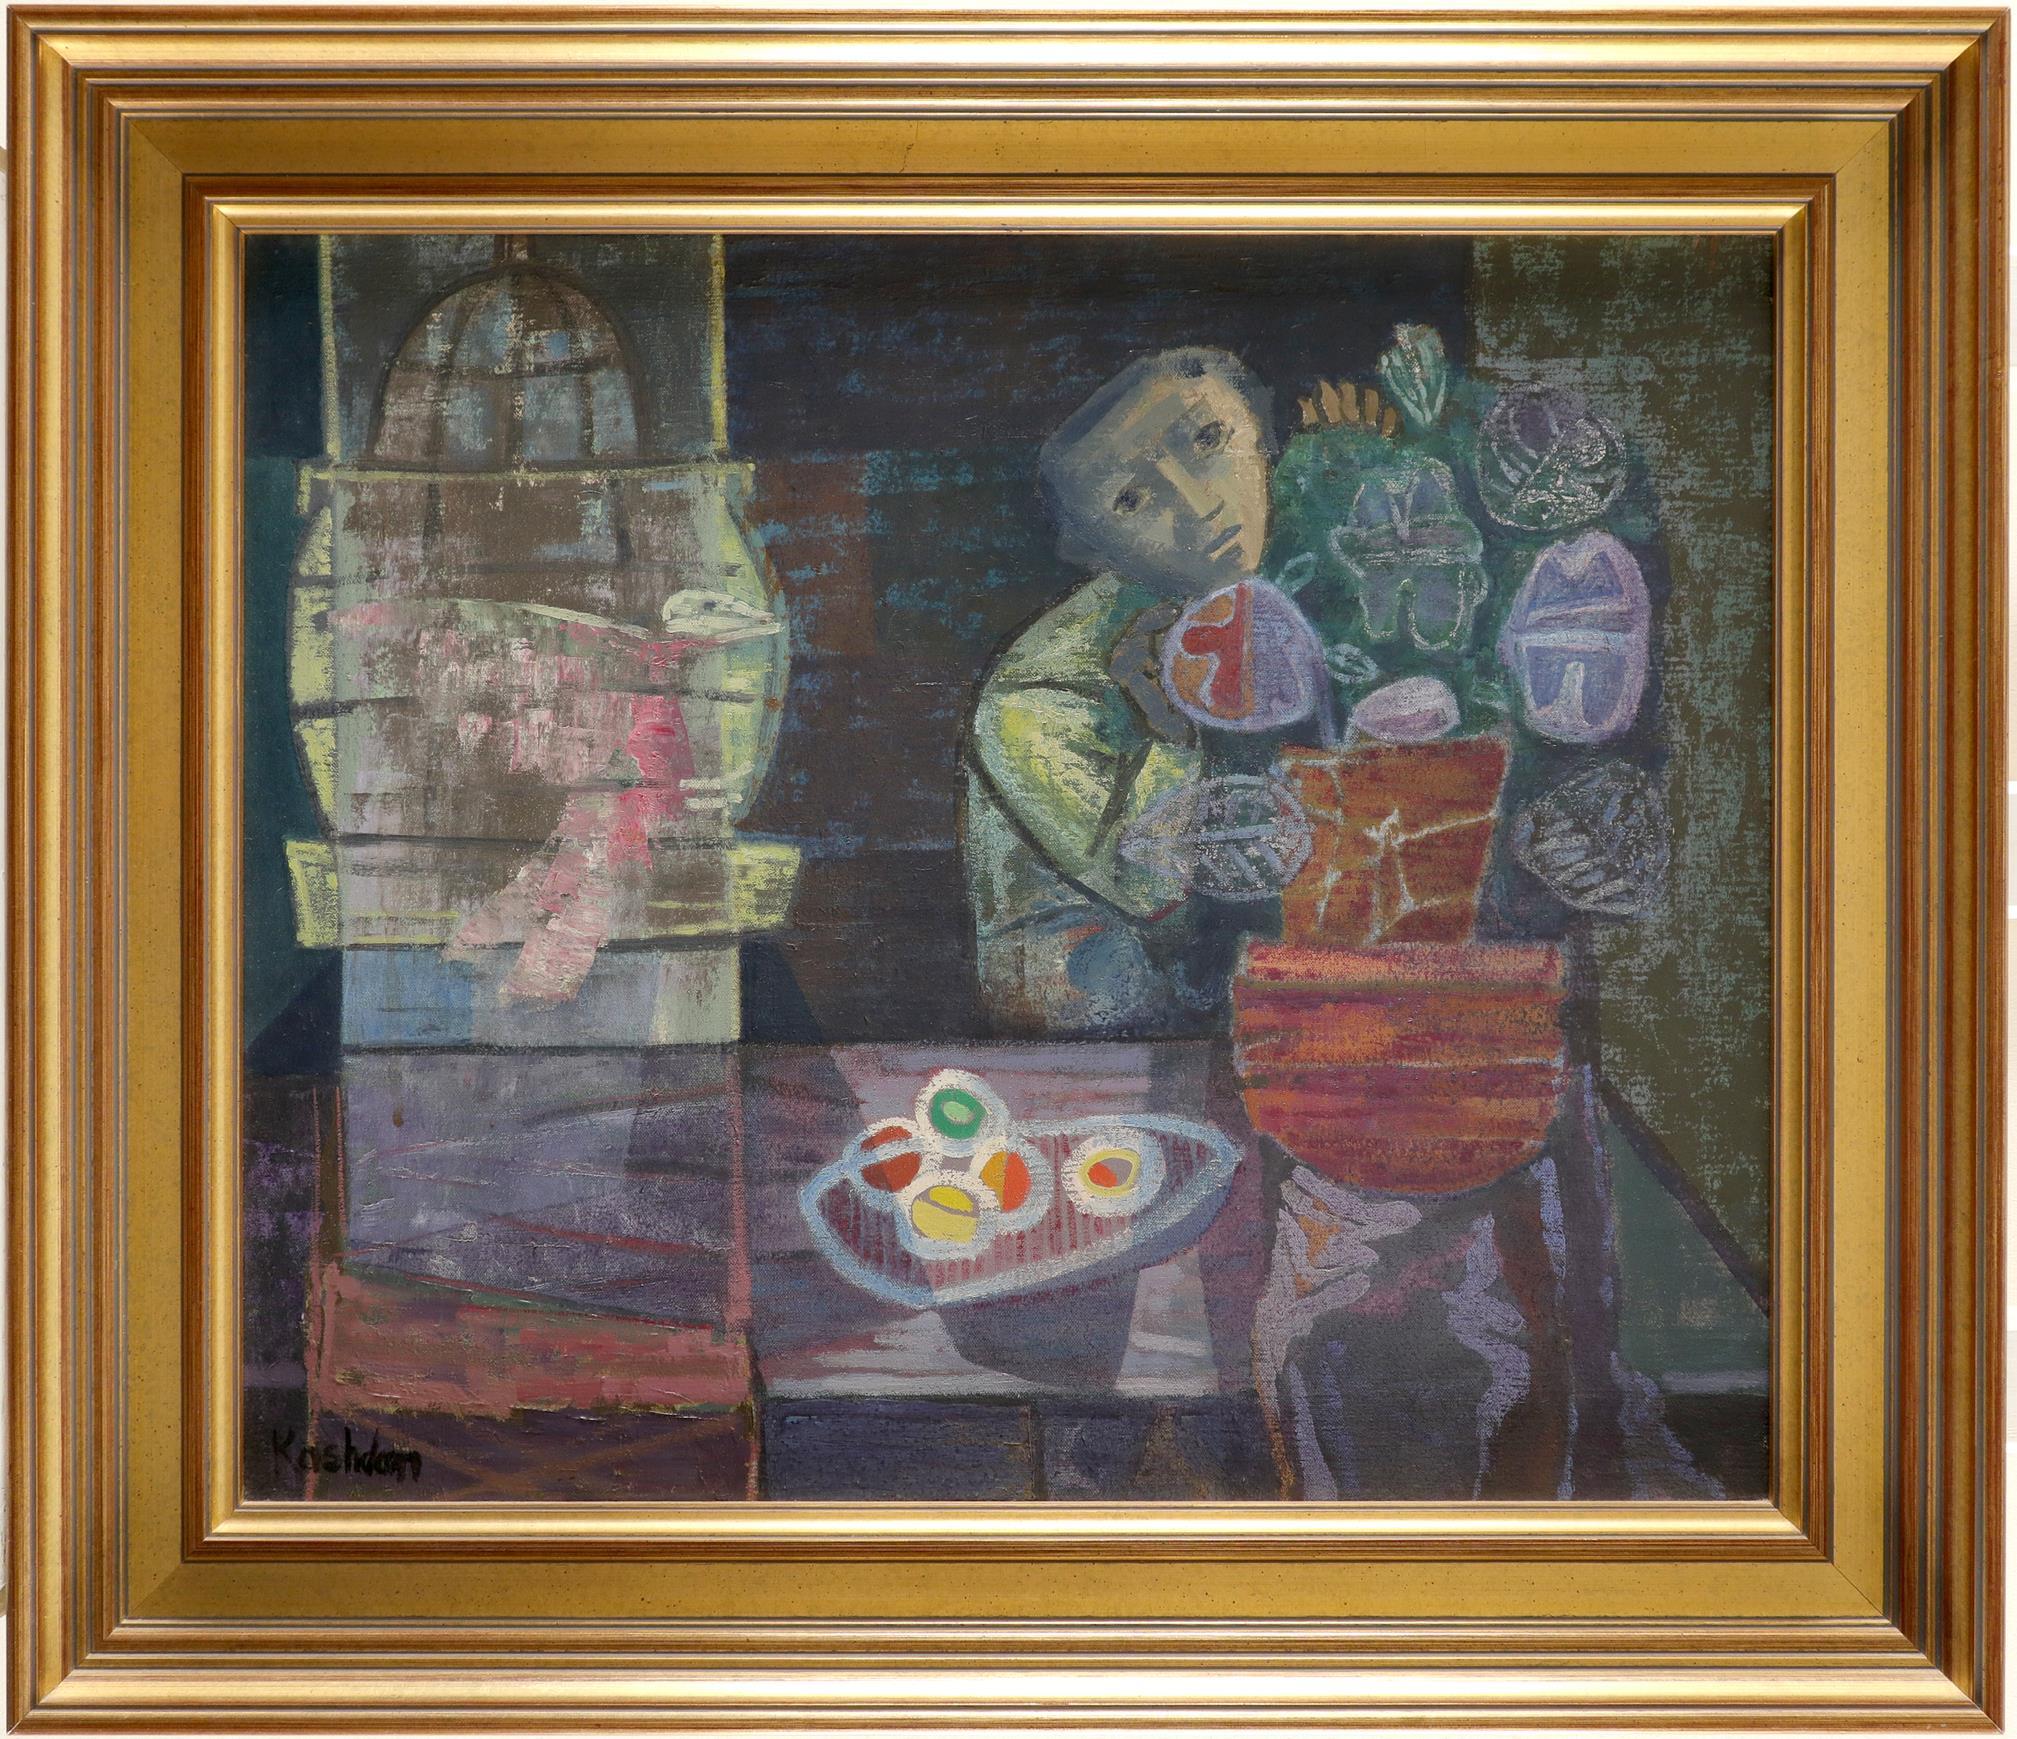 ‡John Kashdan (1917-2001) Boy with Bird Signed Kashdan (lower left) Oil on canvas, c.1949 51.3 x - Image 2 of 3